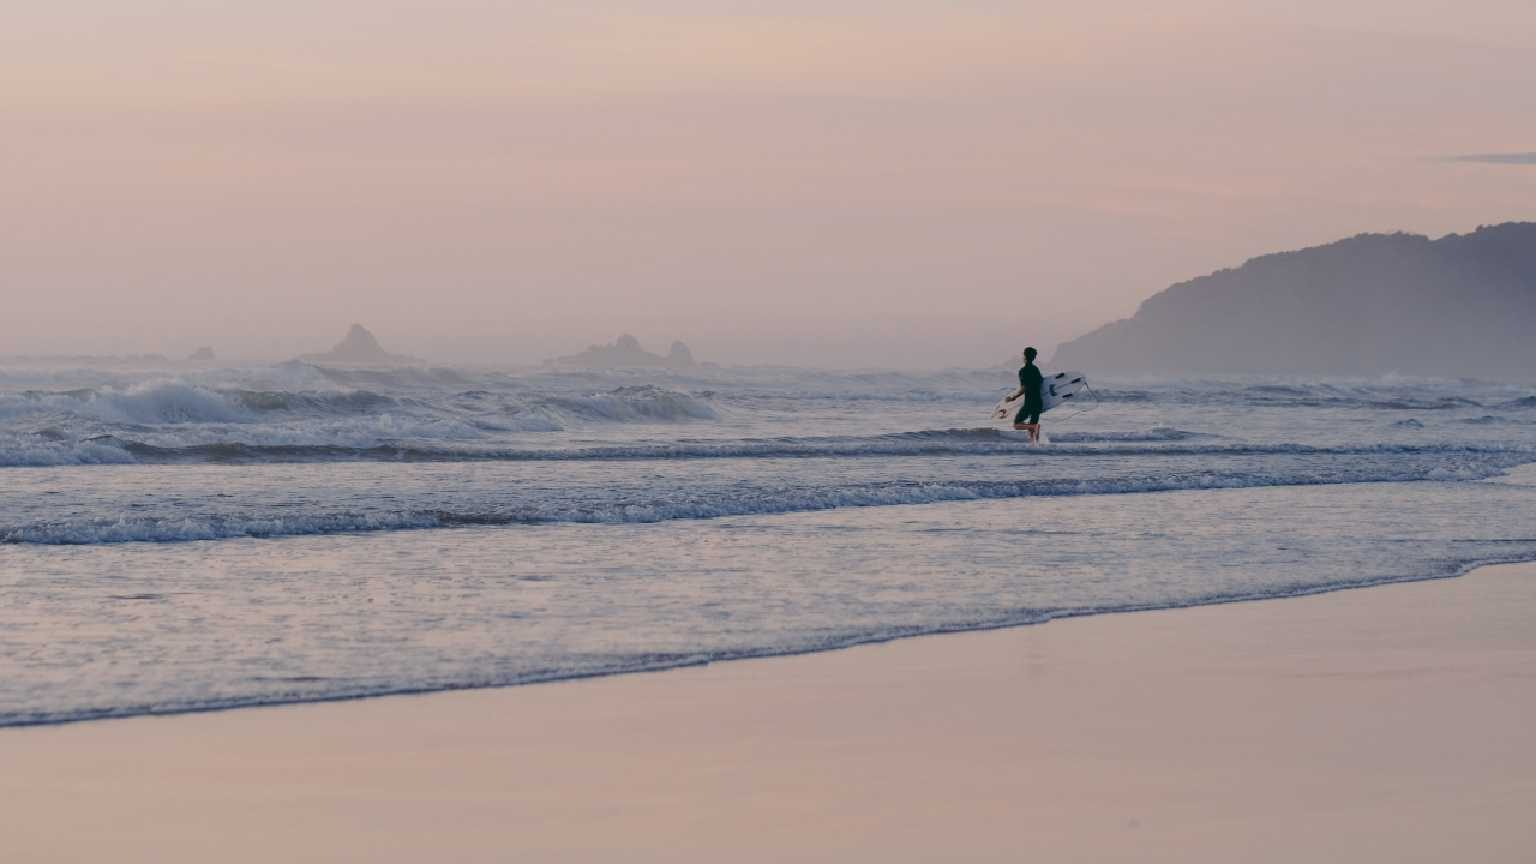 Byron Bay surfer at sunset